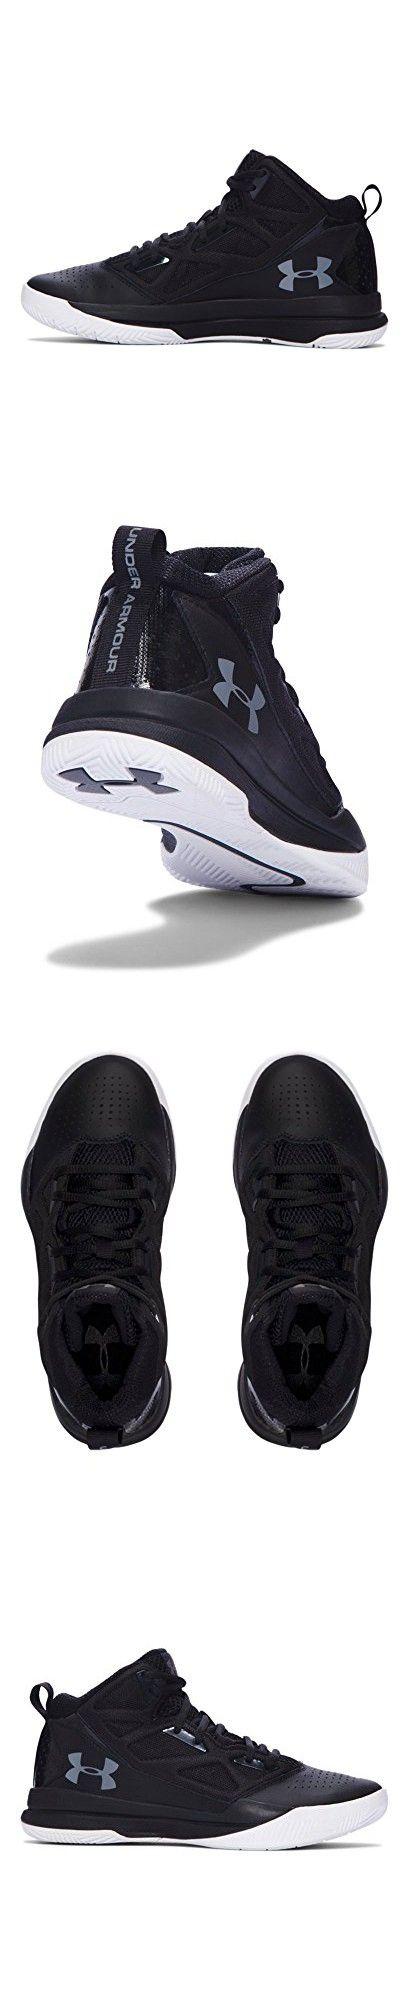 Under Armour Women's UA Jet Mid Basketball Shoes 10 Black